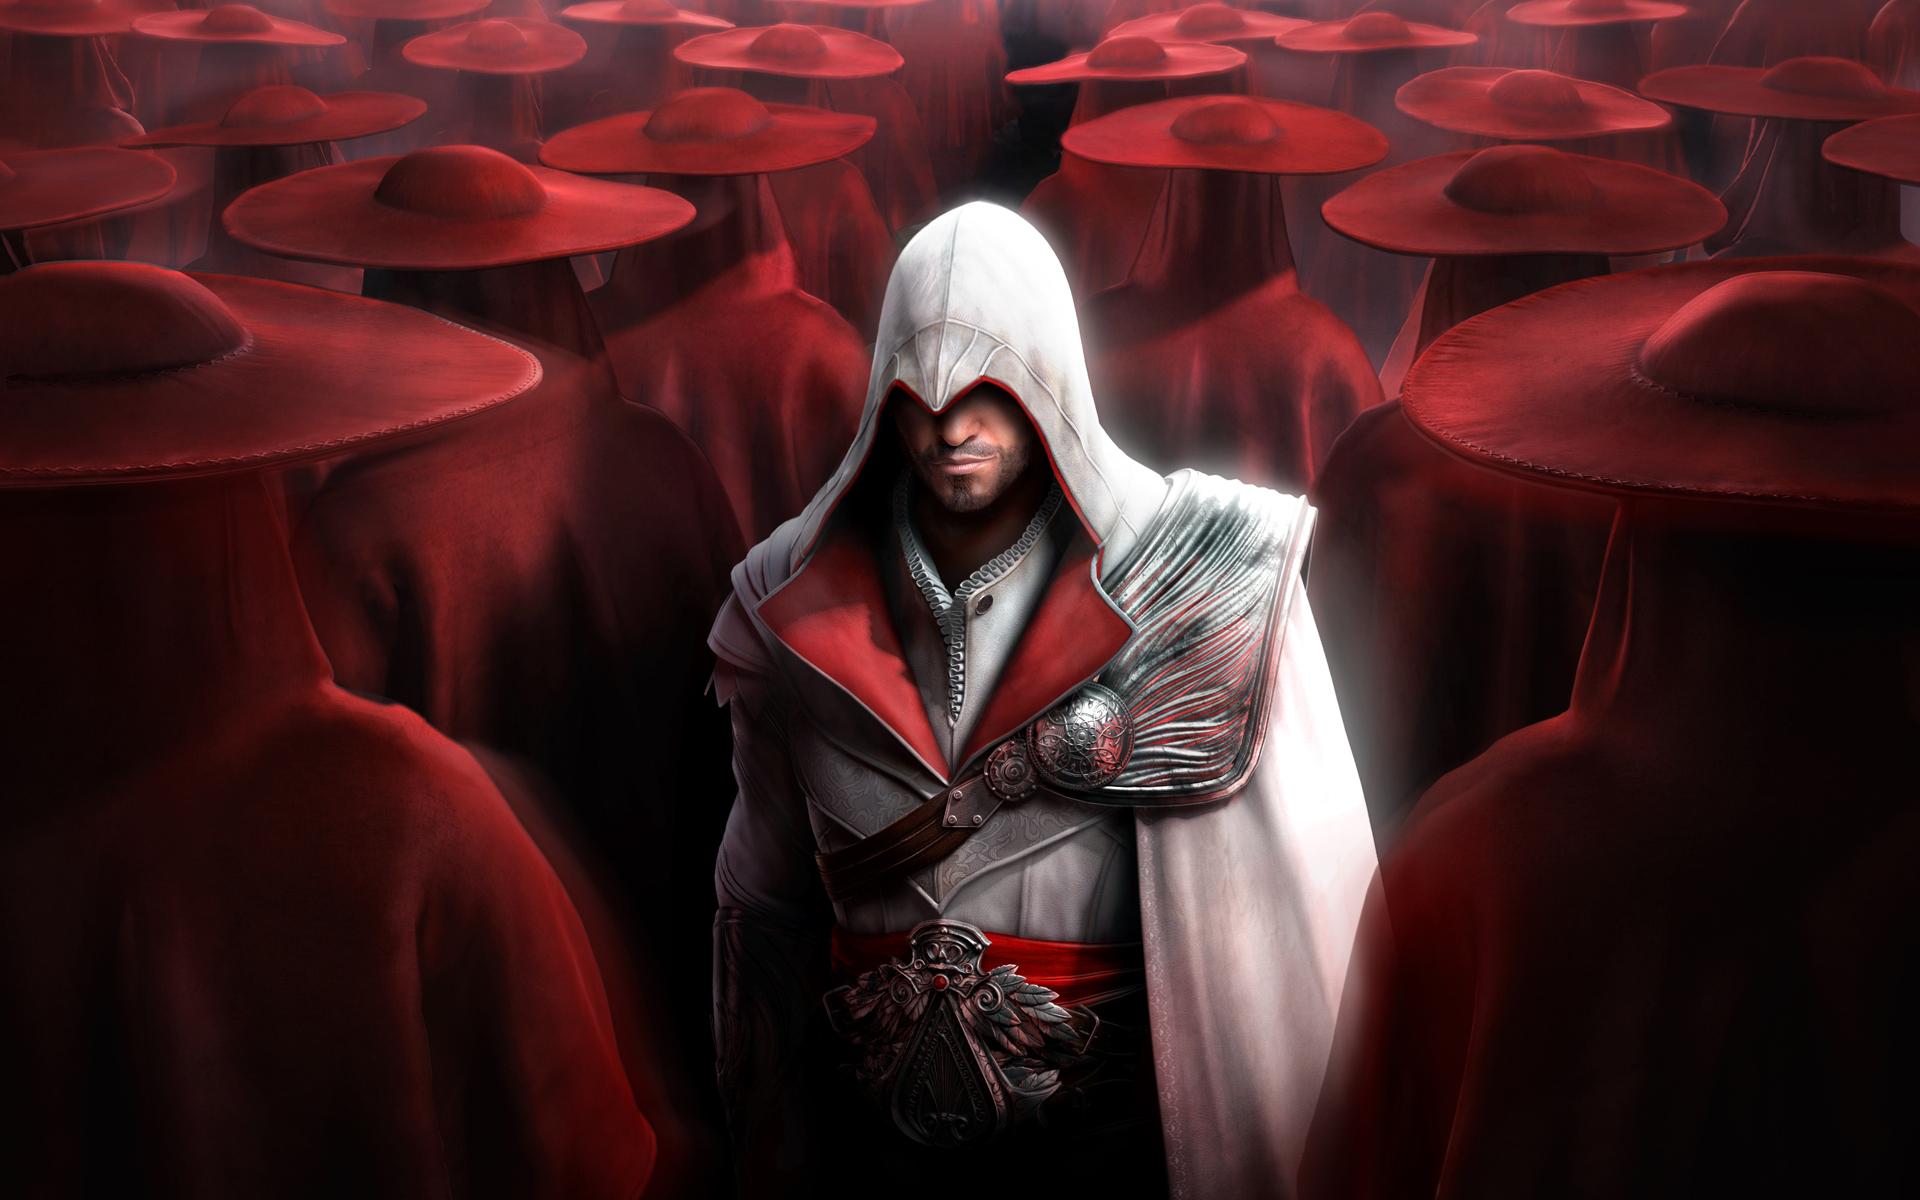 Ezio Assassins Creed Brotherhood Wallpaper 1920x1200 8611